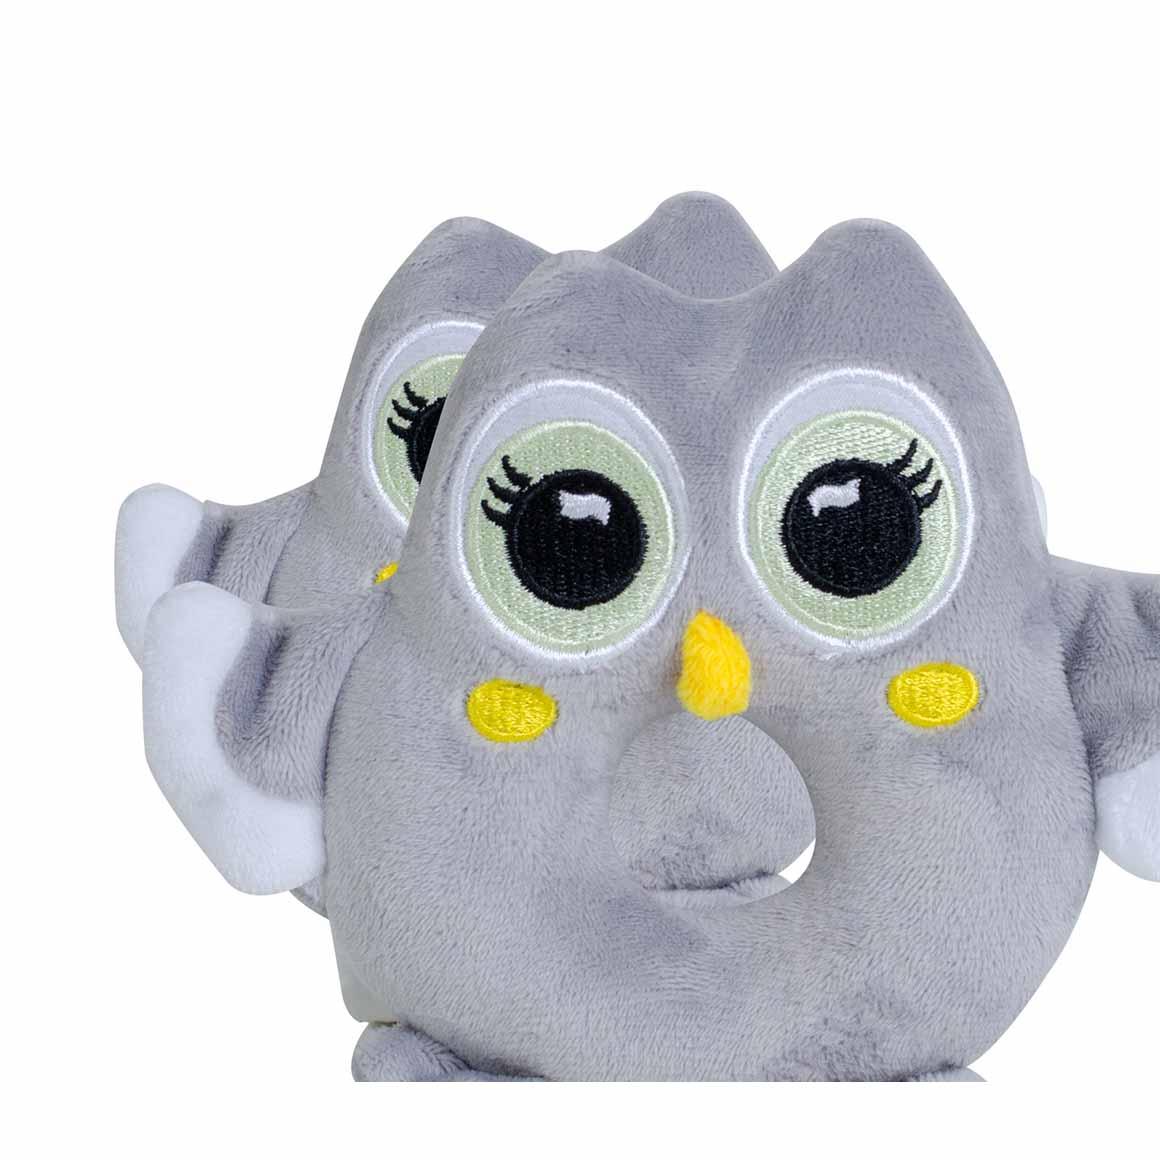 BibiBaby Cuddle Rattle - Toot Owl   Trada Marketplace